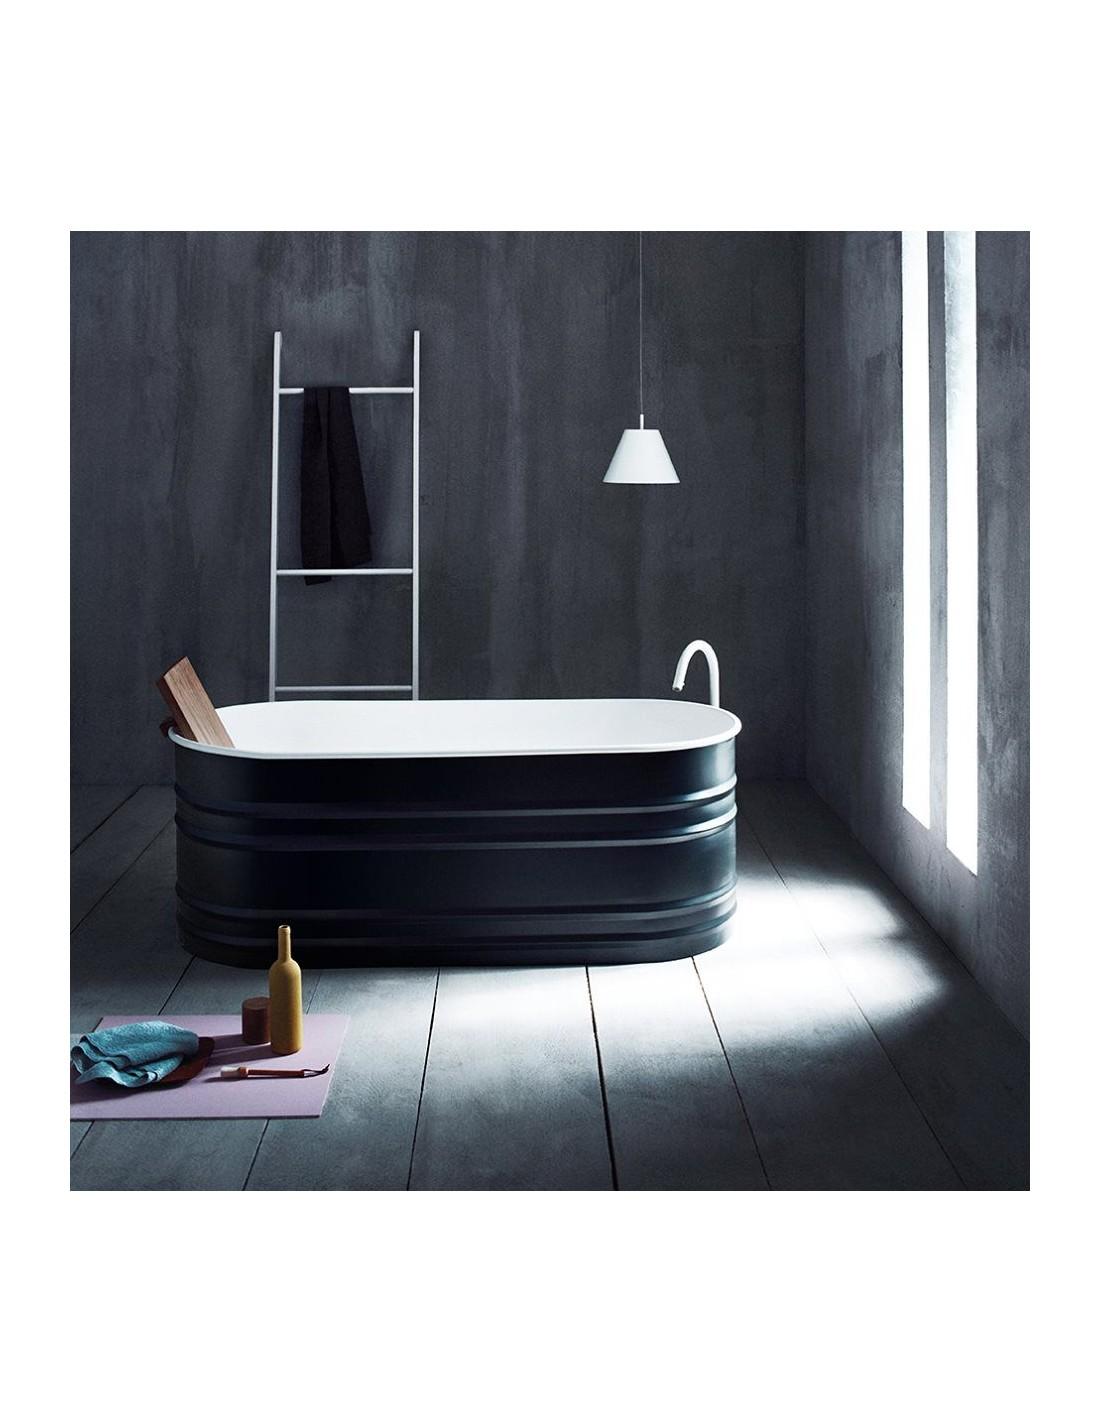 baignoire vieques agape valente design